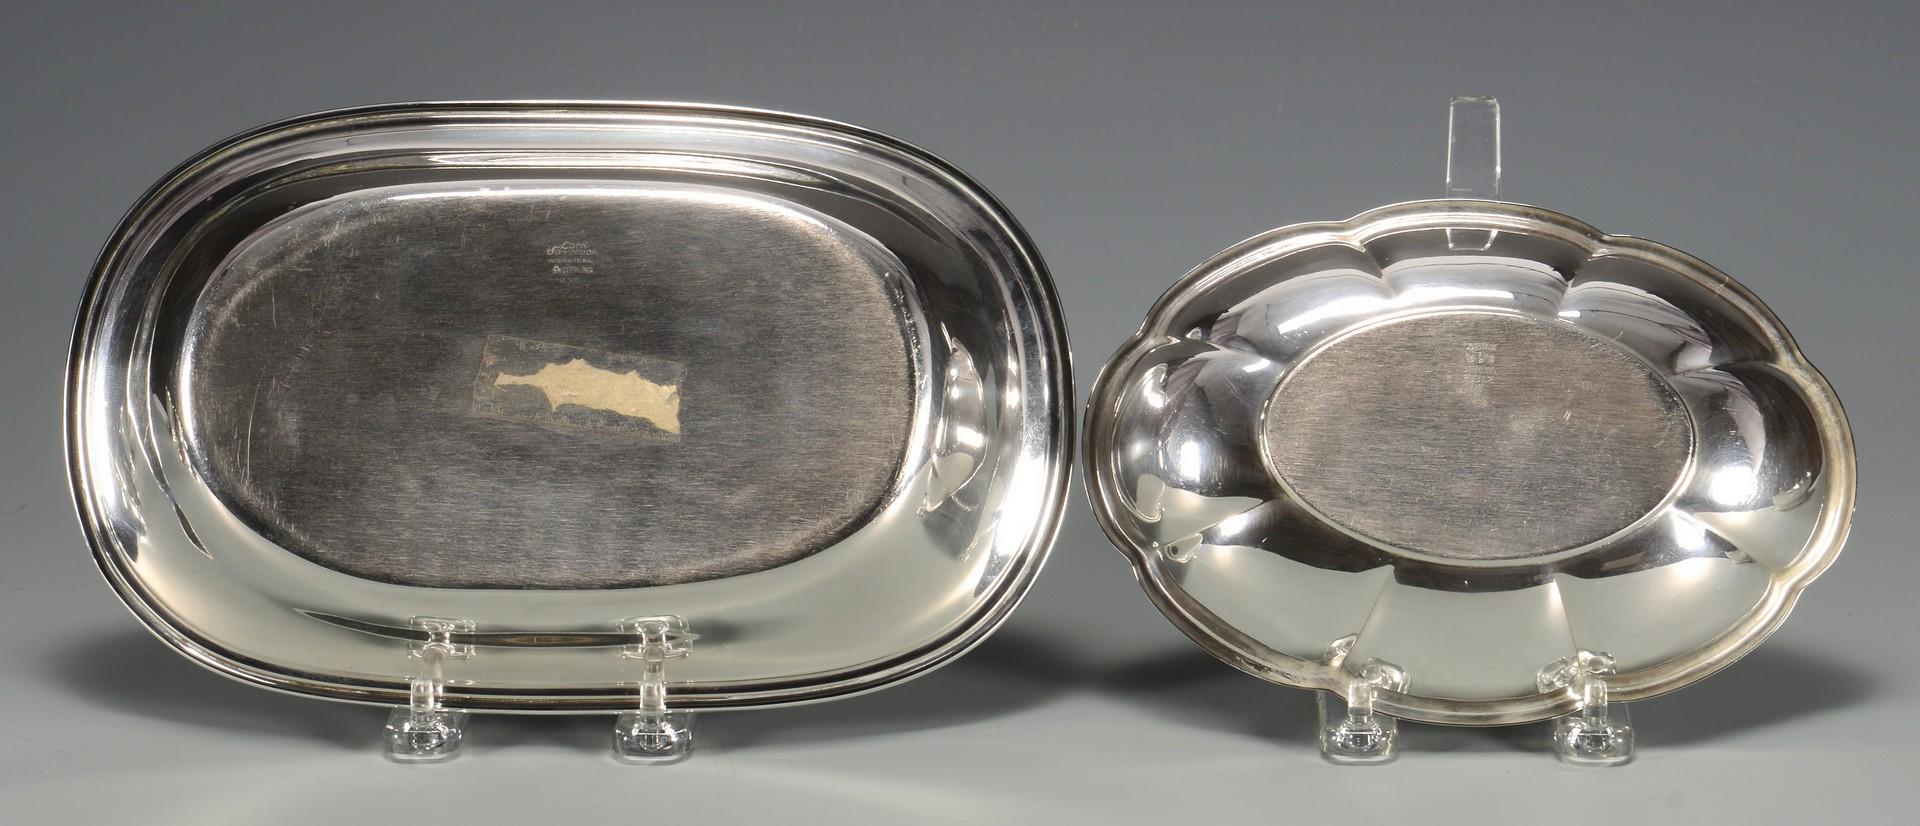 Lot 670: 5 pcs Sterling Hollowware inc. Revere Bowls